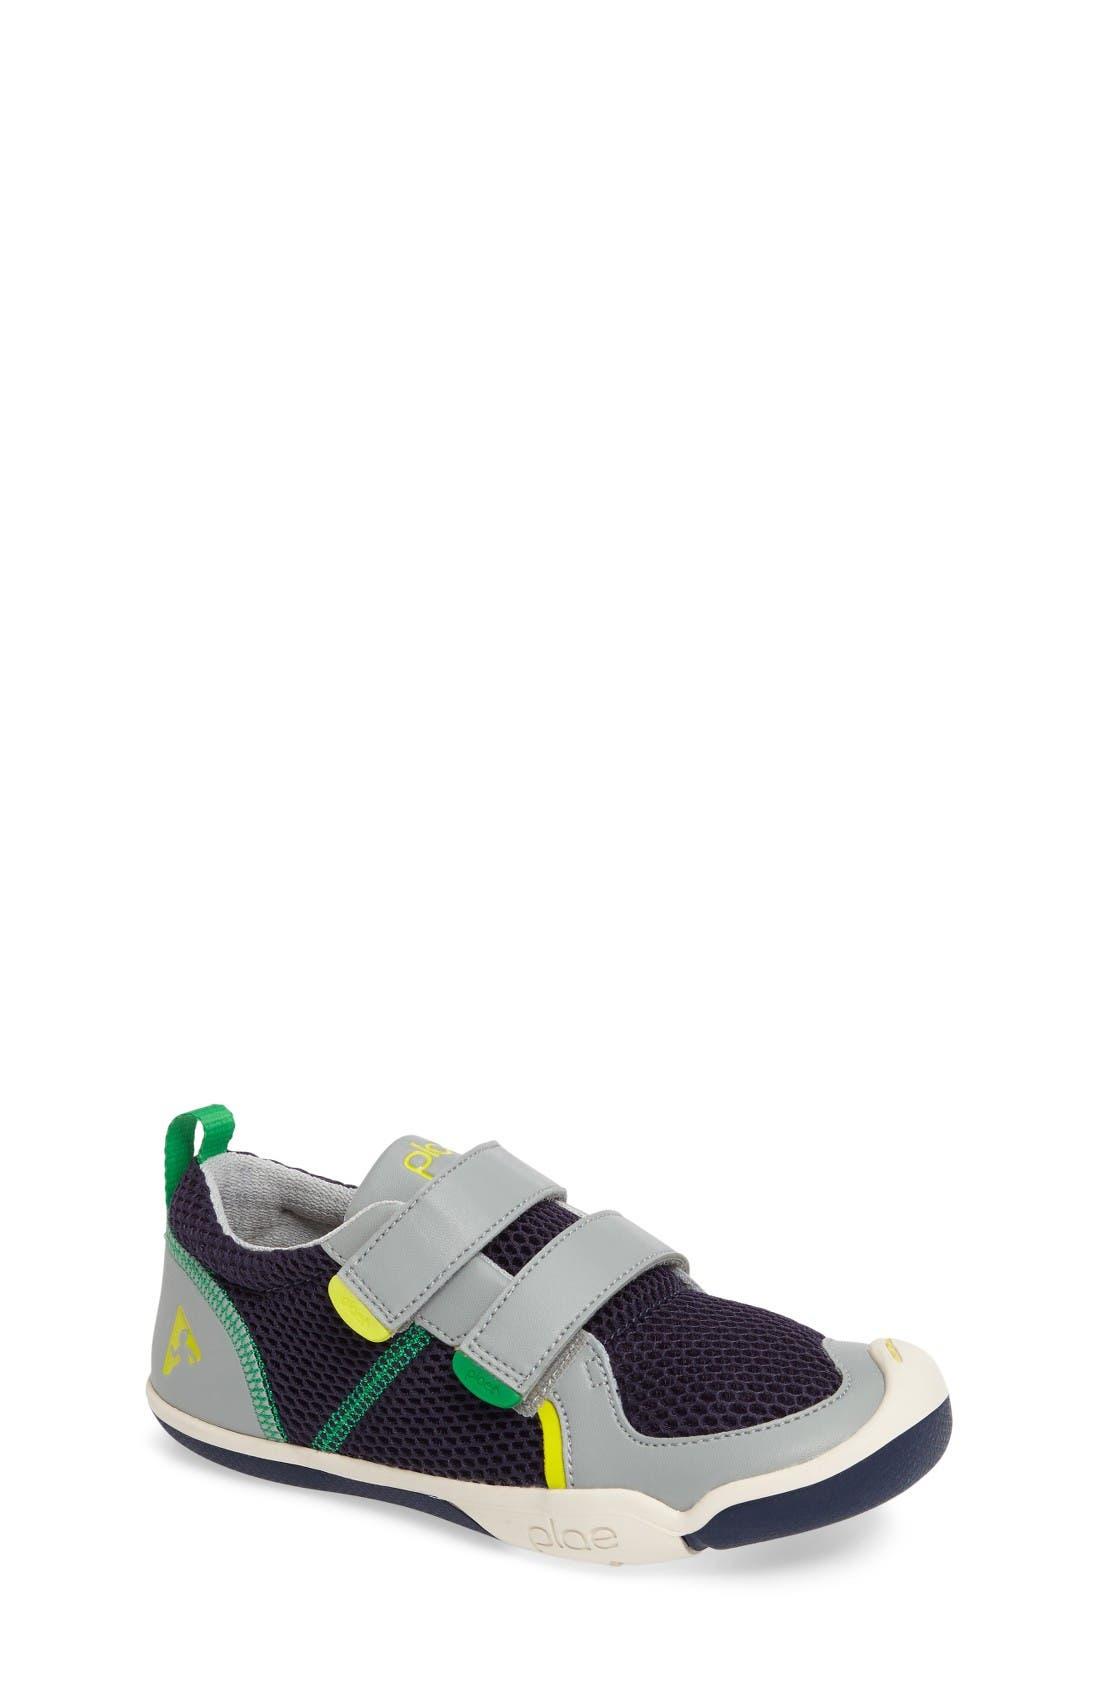 Main Image - PLAE 'Ty' Customizable Sneaker (Walker, Toddler & Little Kid)